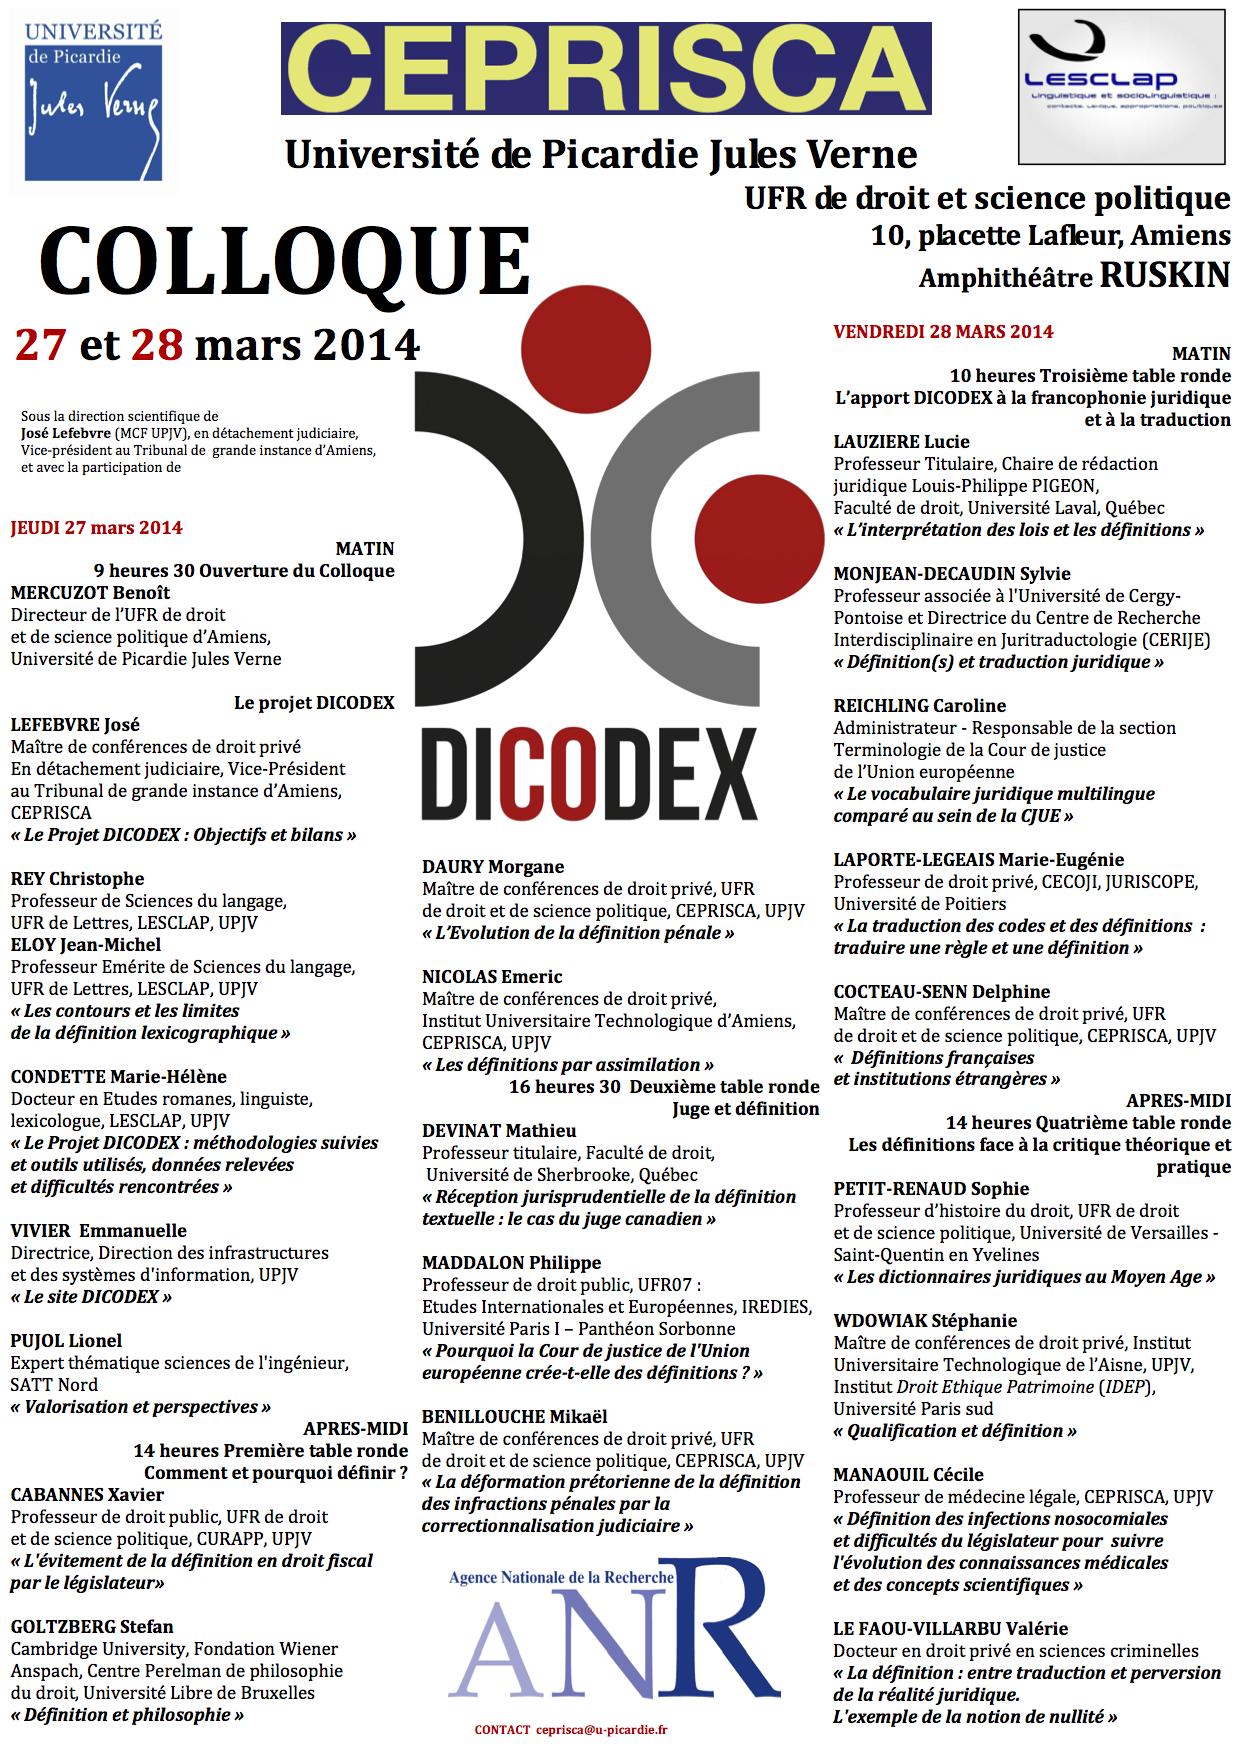 AFFICHE  DICODEX - 27-28 mars  2014 - CEPRISCA